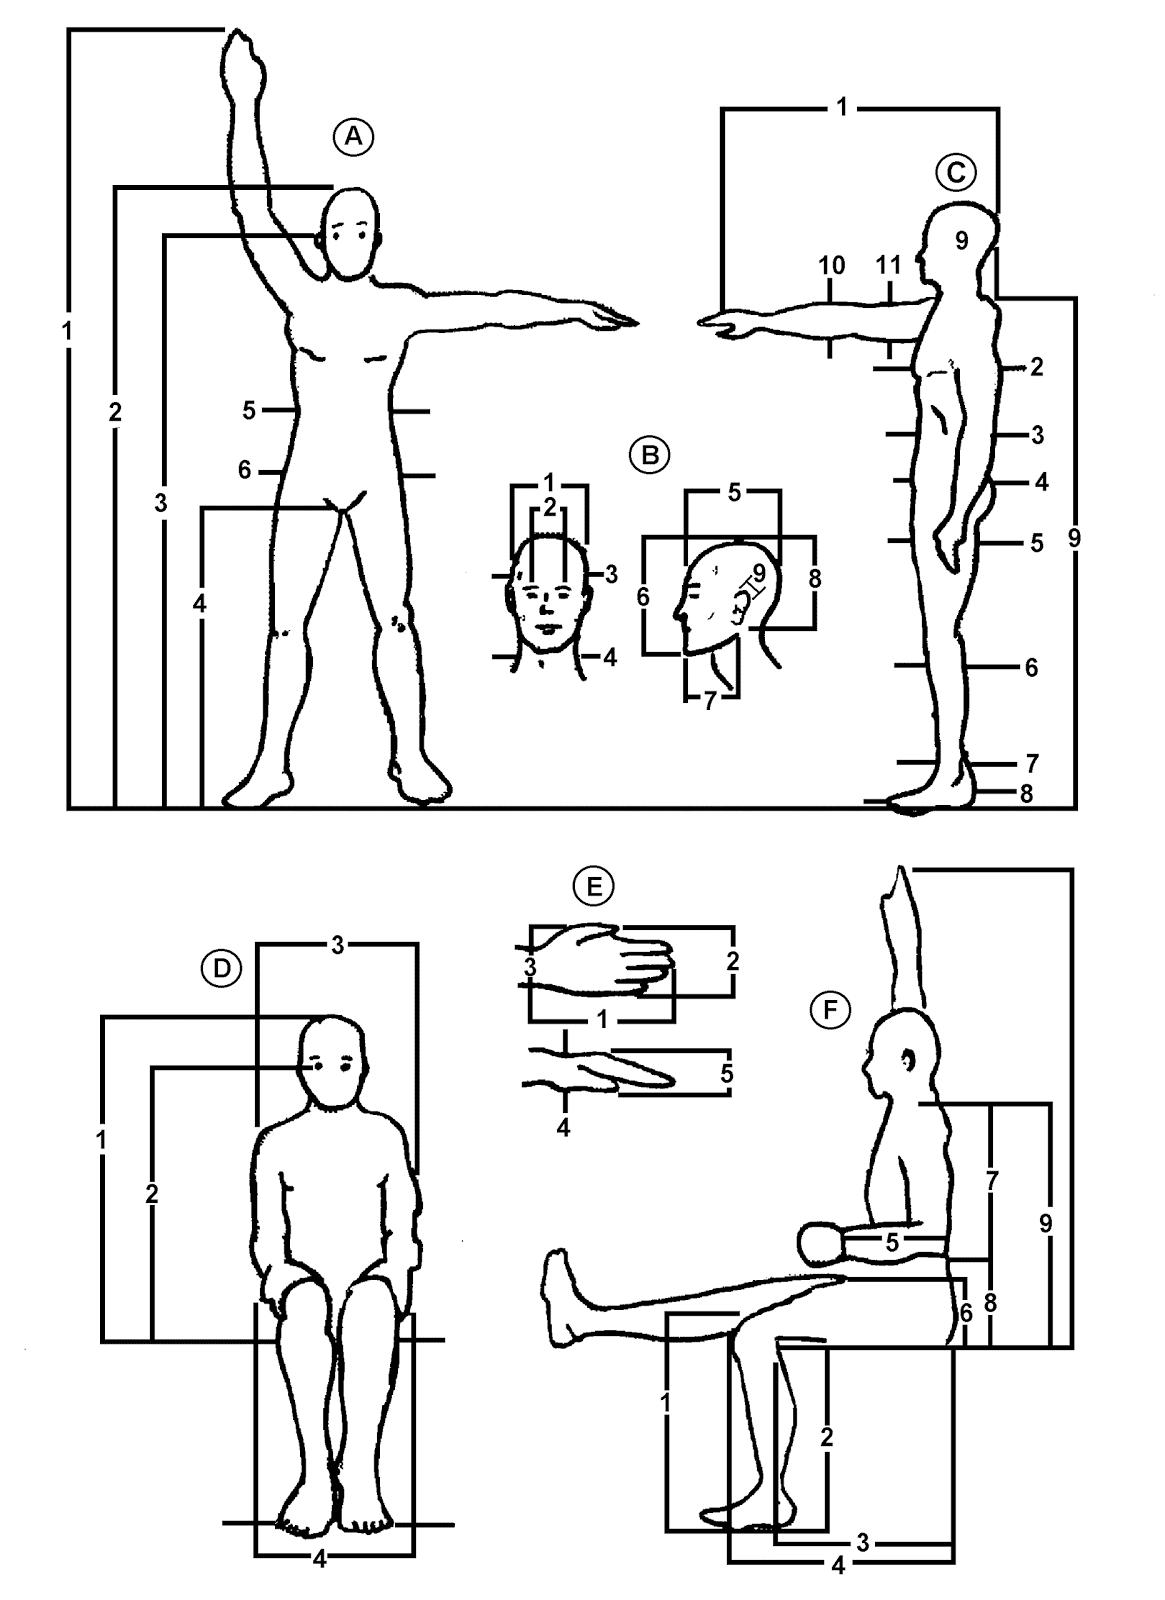 Mc jeyko antropometria ergonomia for Arquitectura ergonomica